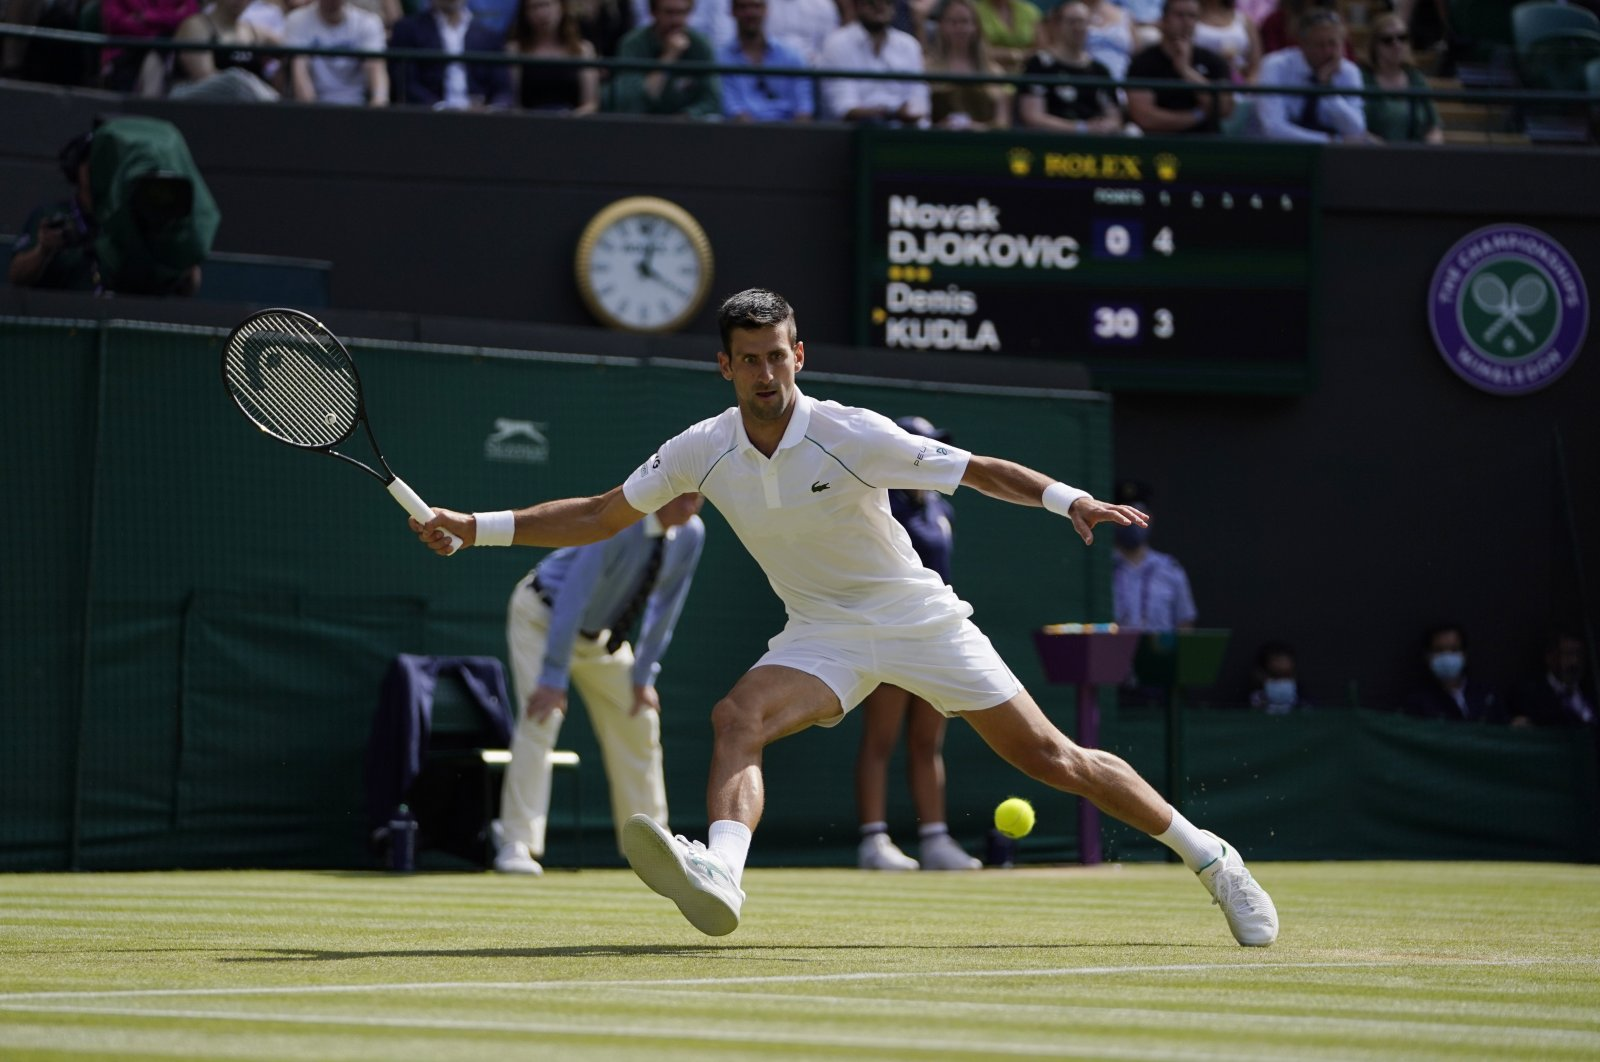 Serbia's Novak Djokovic plays a return to Denis Kudla of the U.S. during the Wimbledon men's singles third round match in London, England, July 2, 2021. (AP Photo)